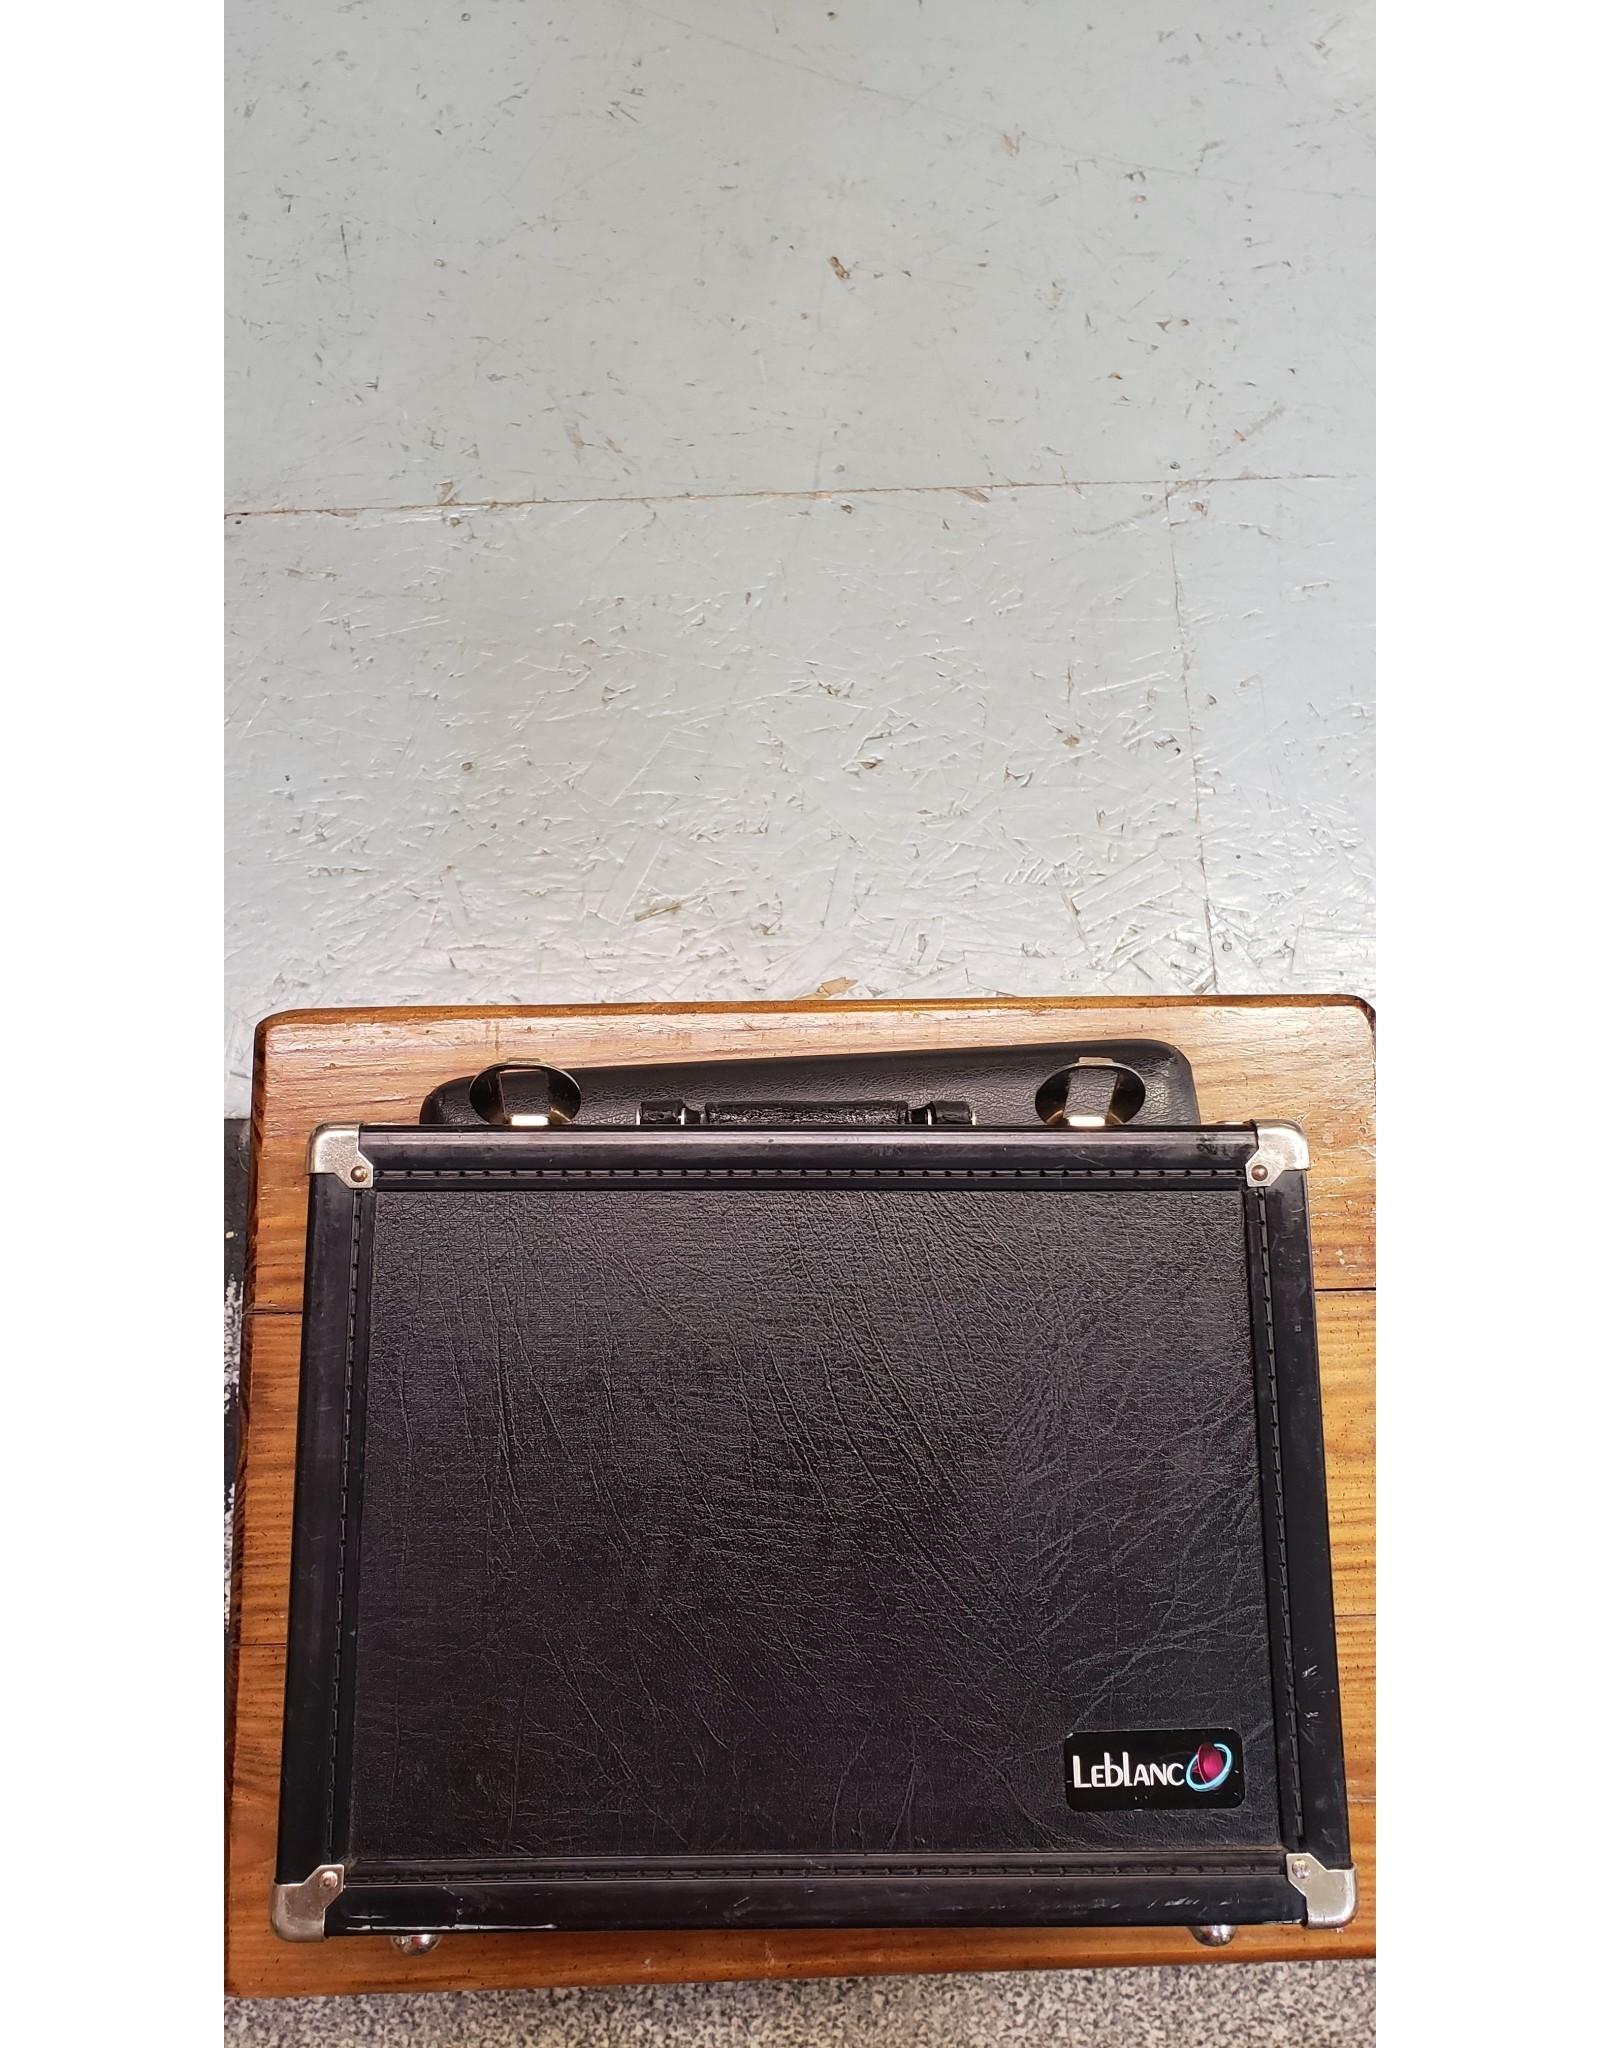 Artley Artley 17S USA Clarinet (used)